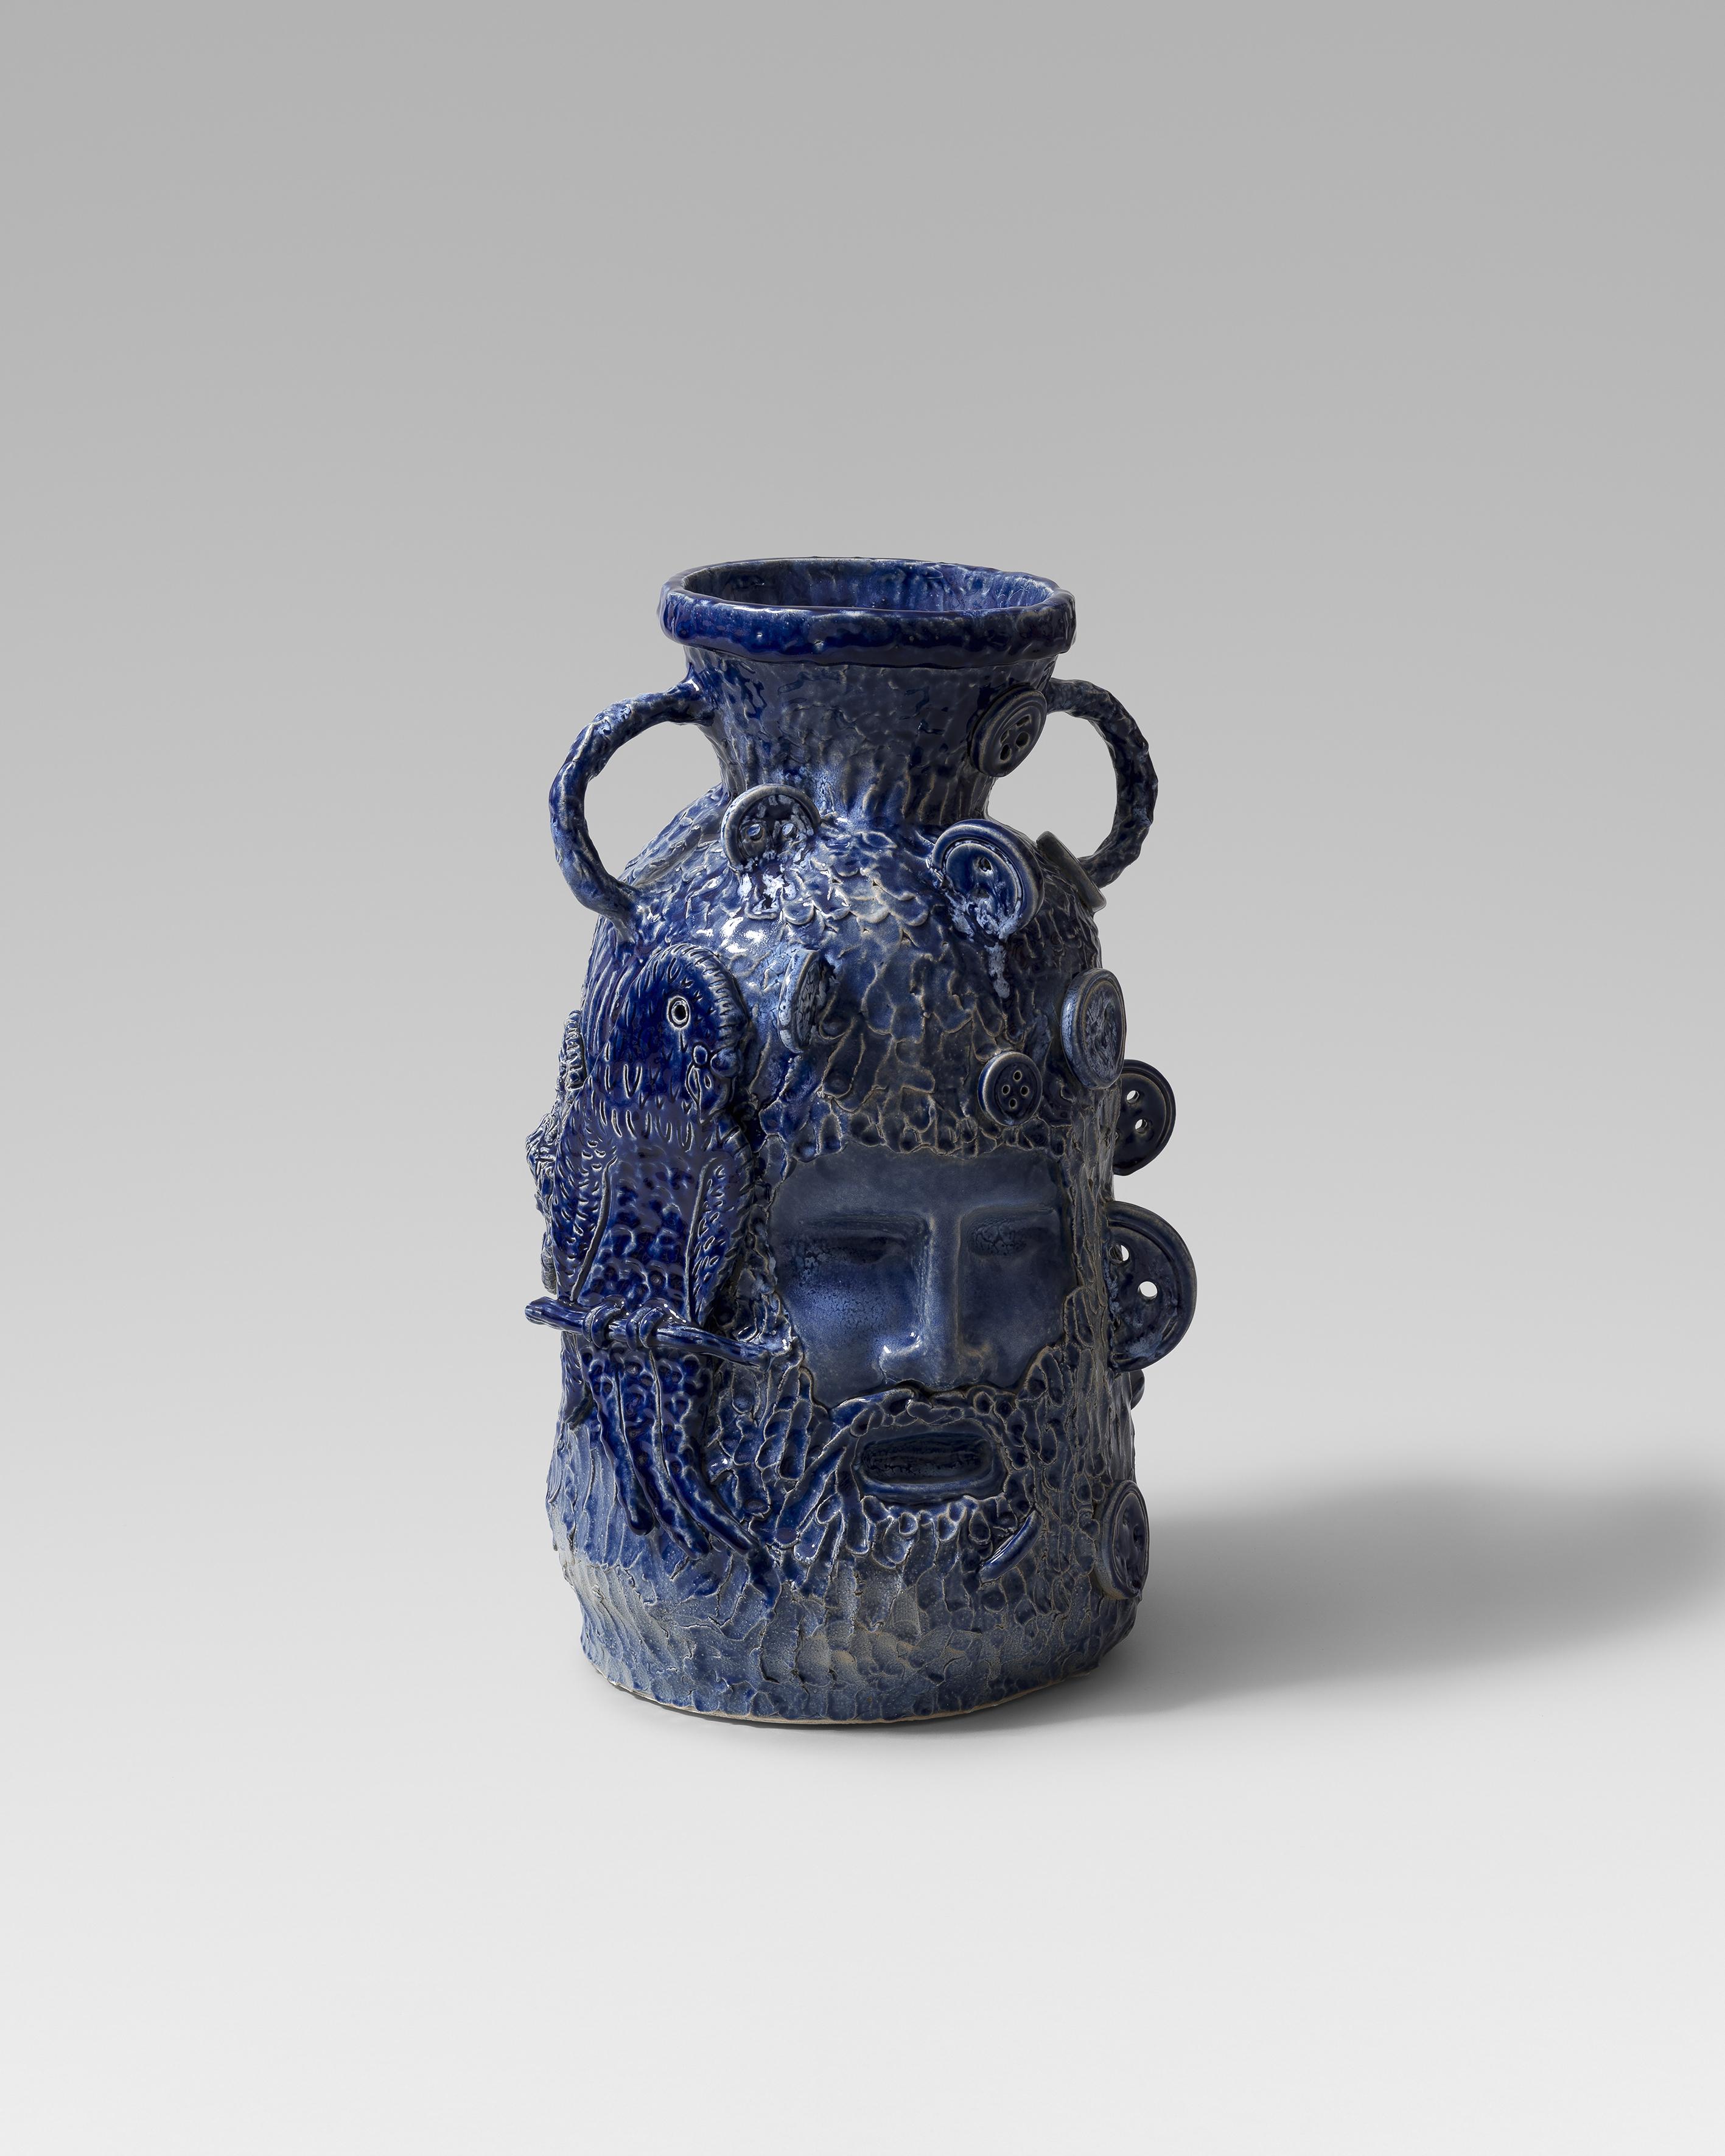 Ulysses and Parakeet, 2019. 54 x 31 x 33 cm. Glazed ceramic